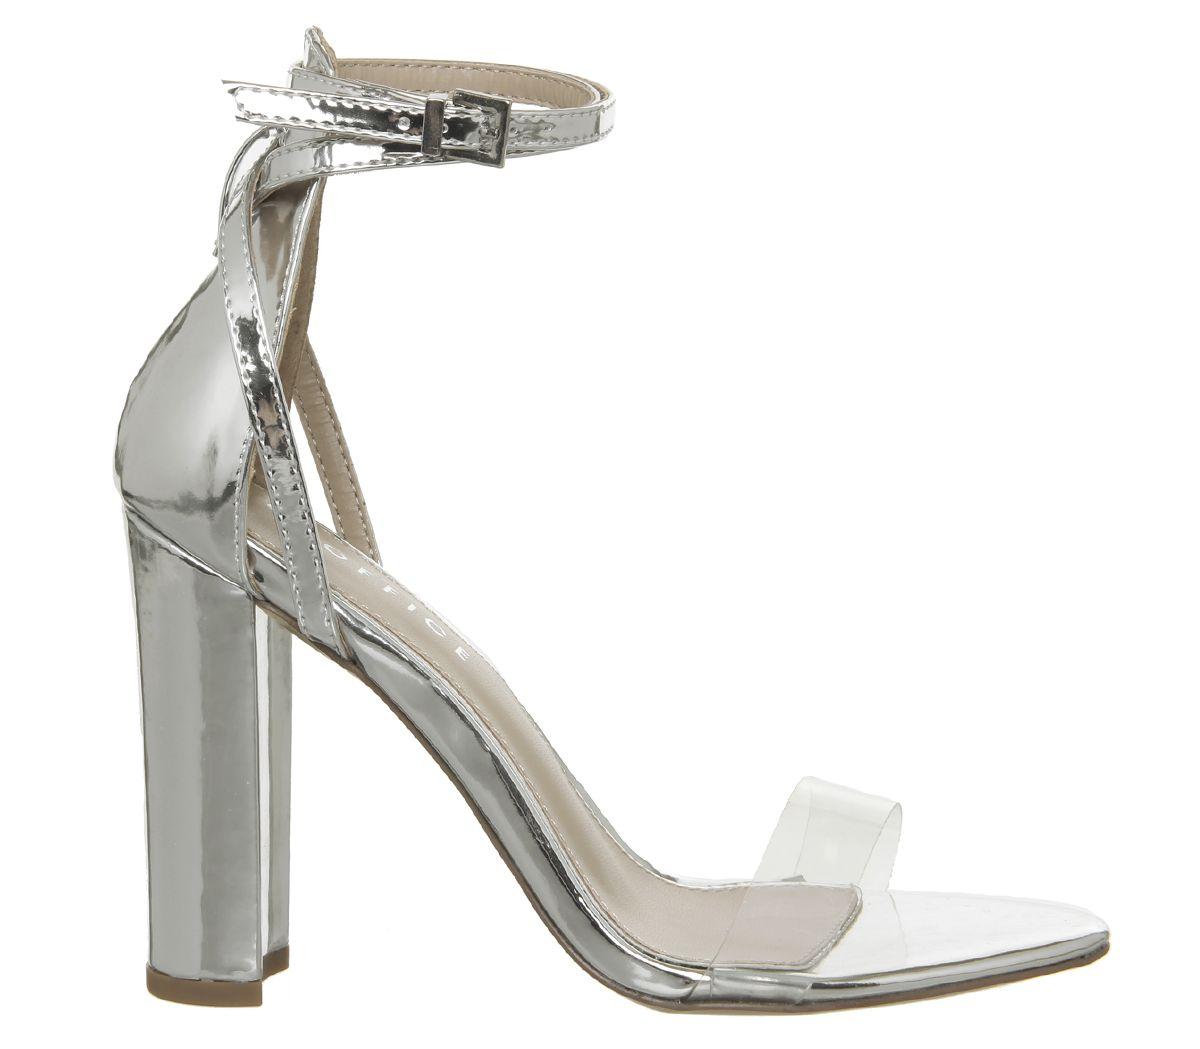 36eaee17fc2 Office Haylee Ankle Strap Block Heels Silver Mirror Clear Strap ...